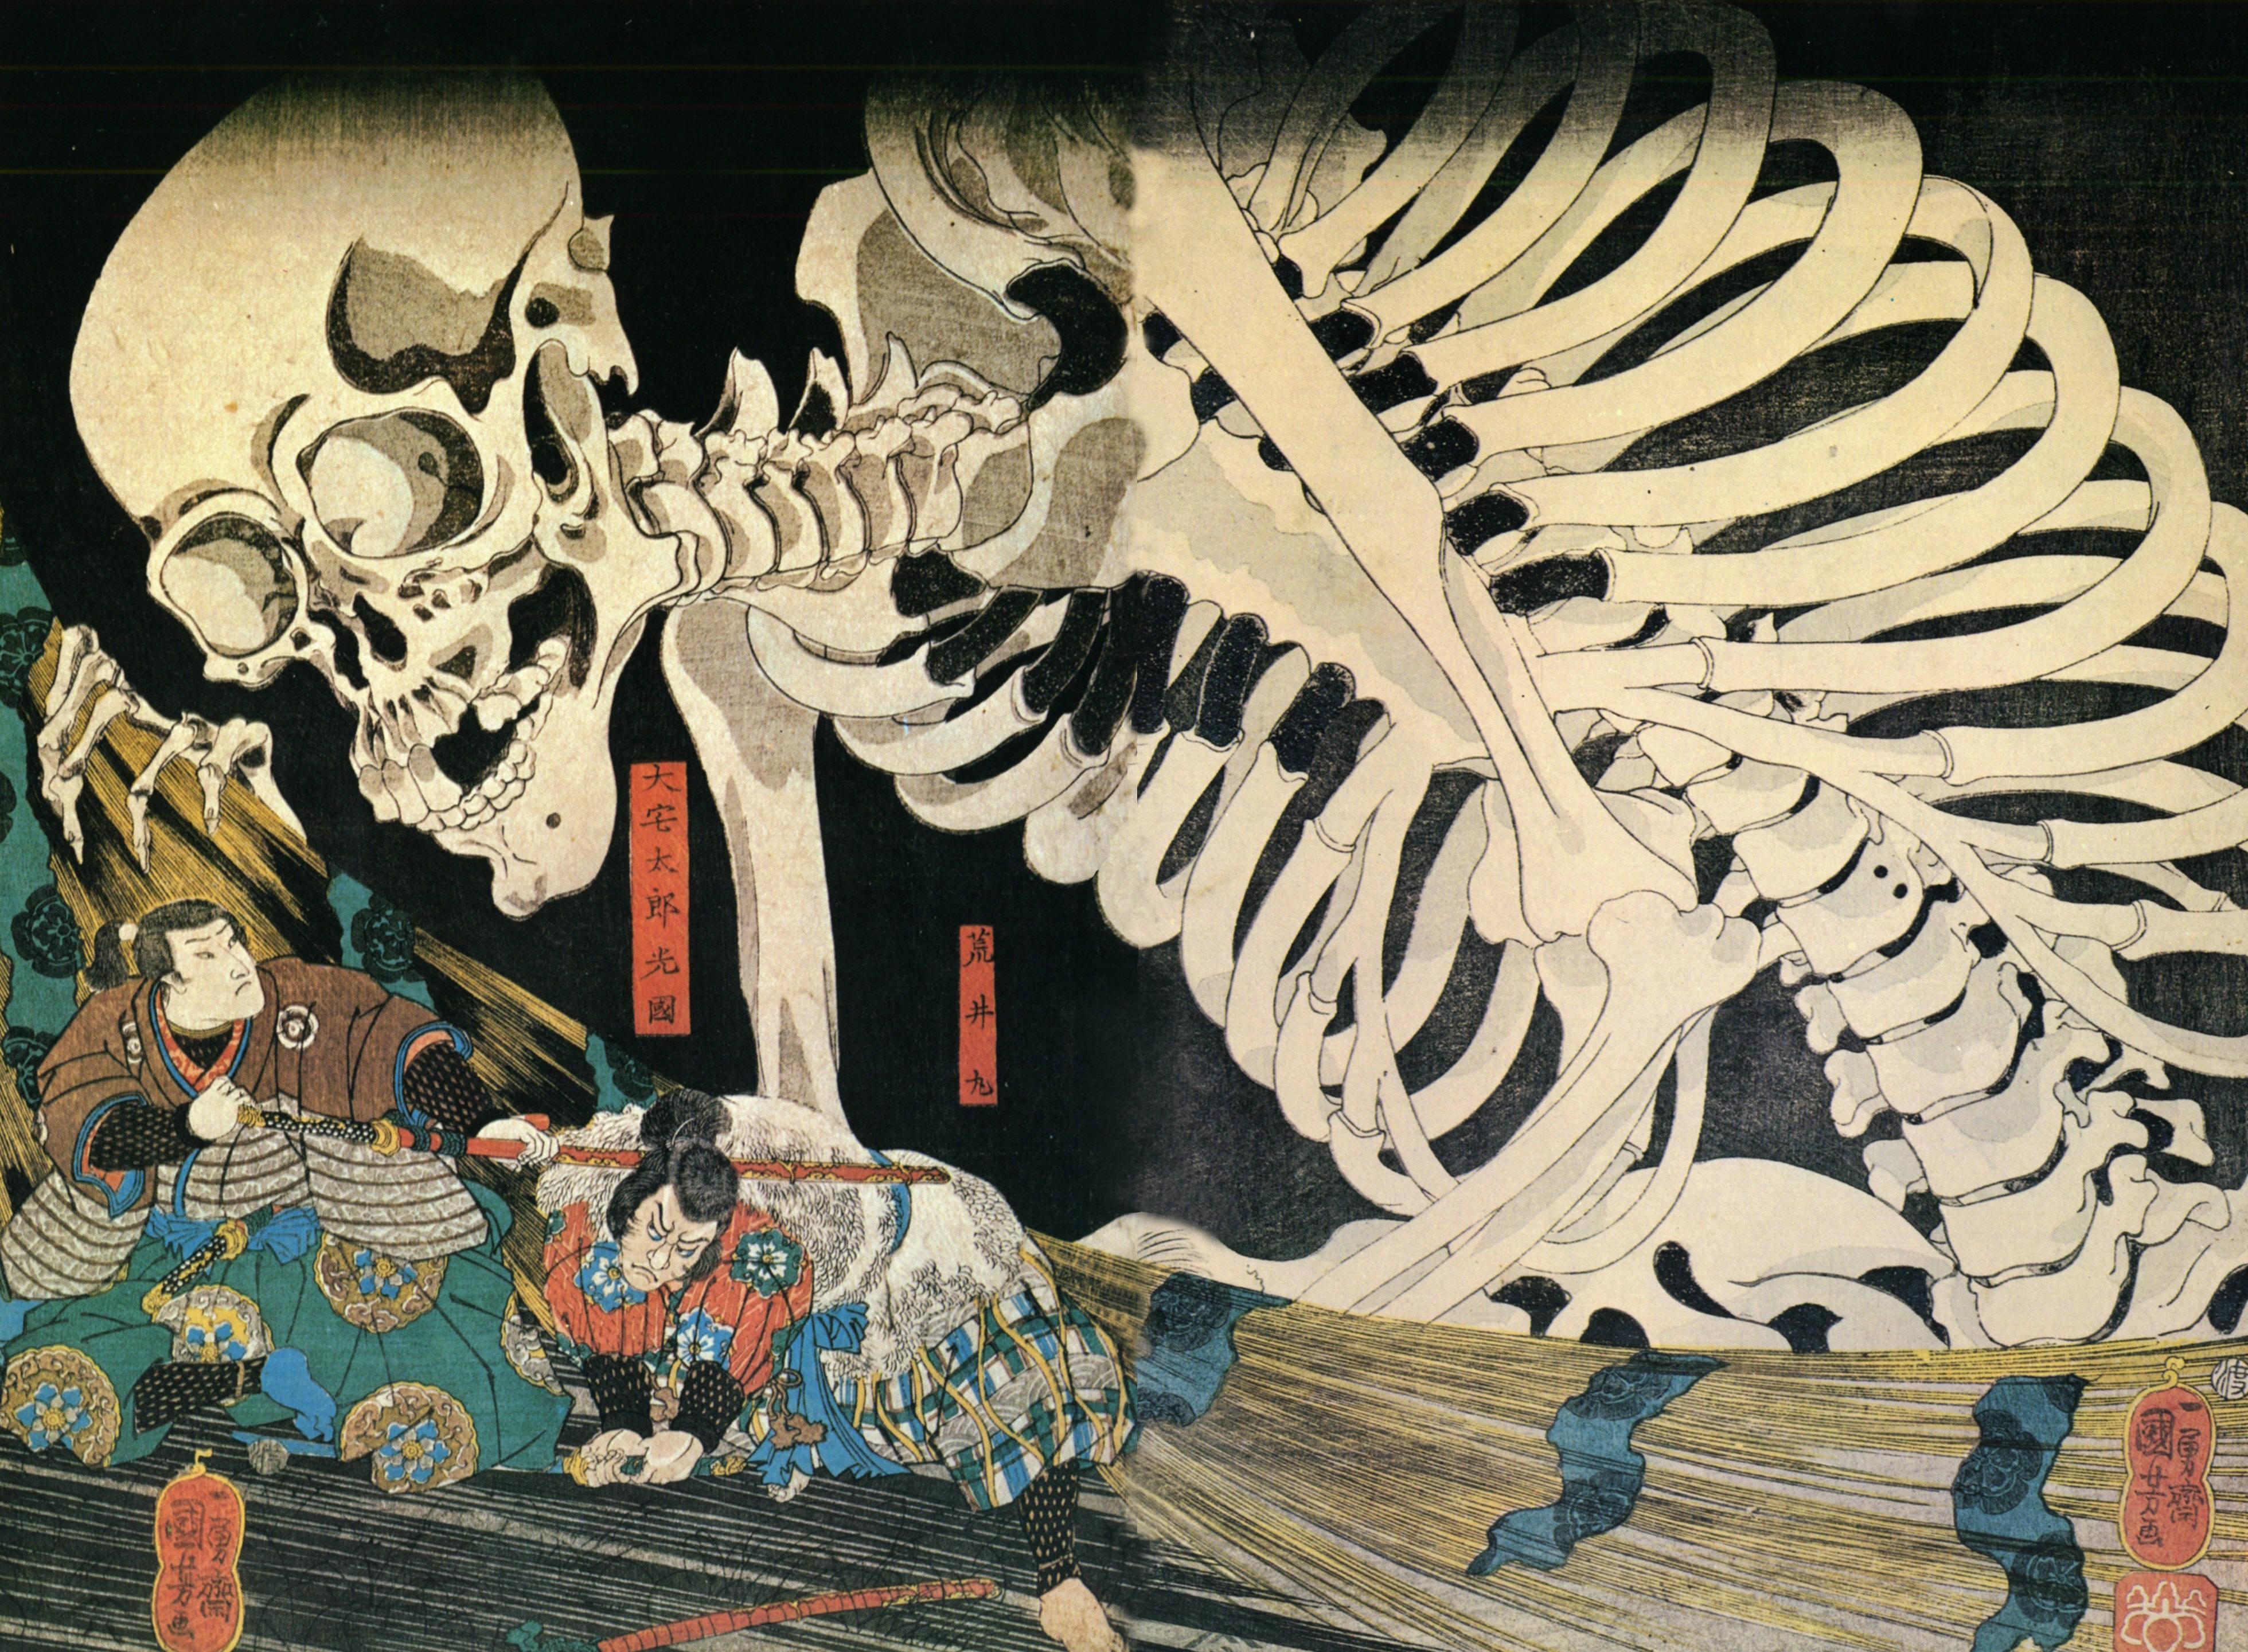 http://upload.wikimedia.org/wikipedia/commons/f/f9/Kuniyoshi_Utagawa,_Sceleton.jpg